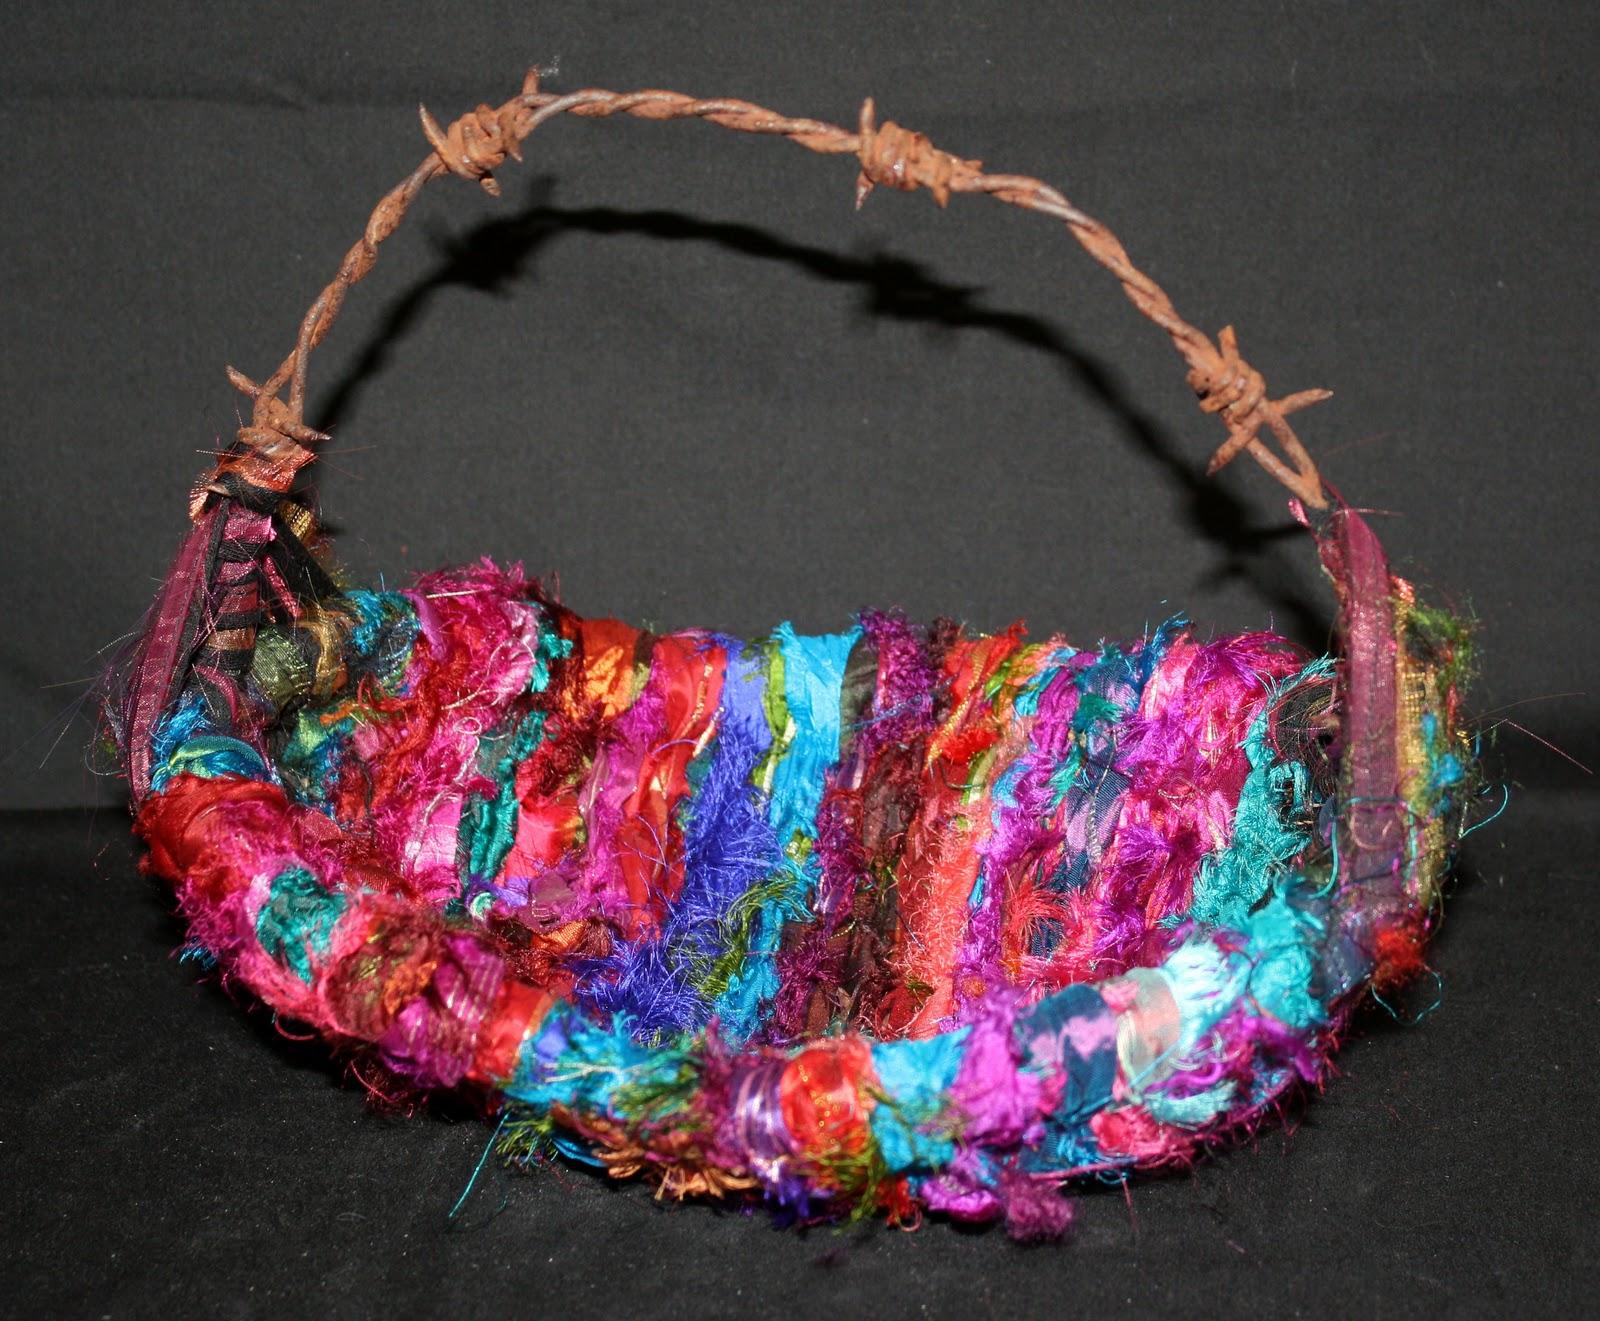 Basket Weaving Adelaide : Sarah bell smith anne lenders baskets